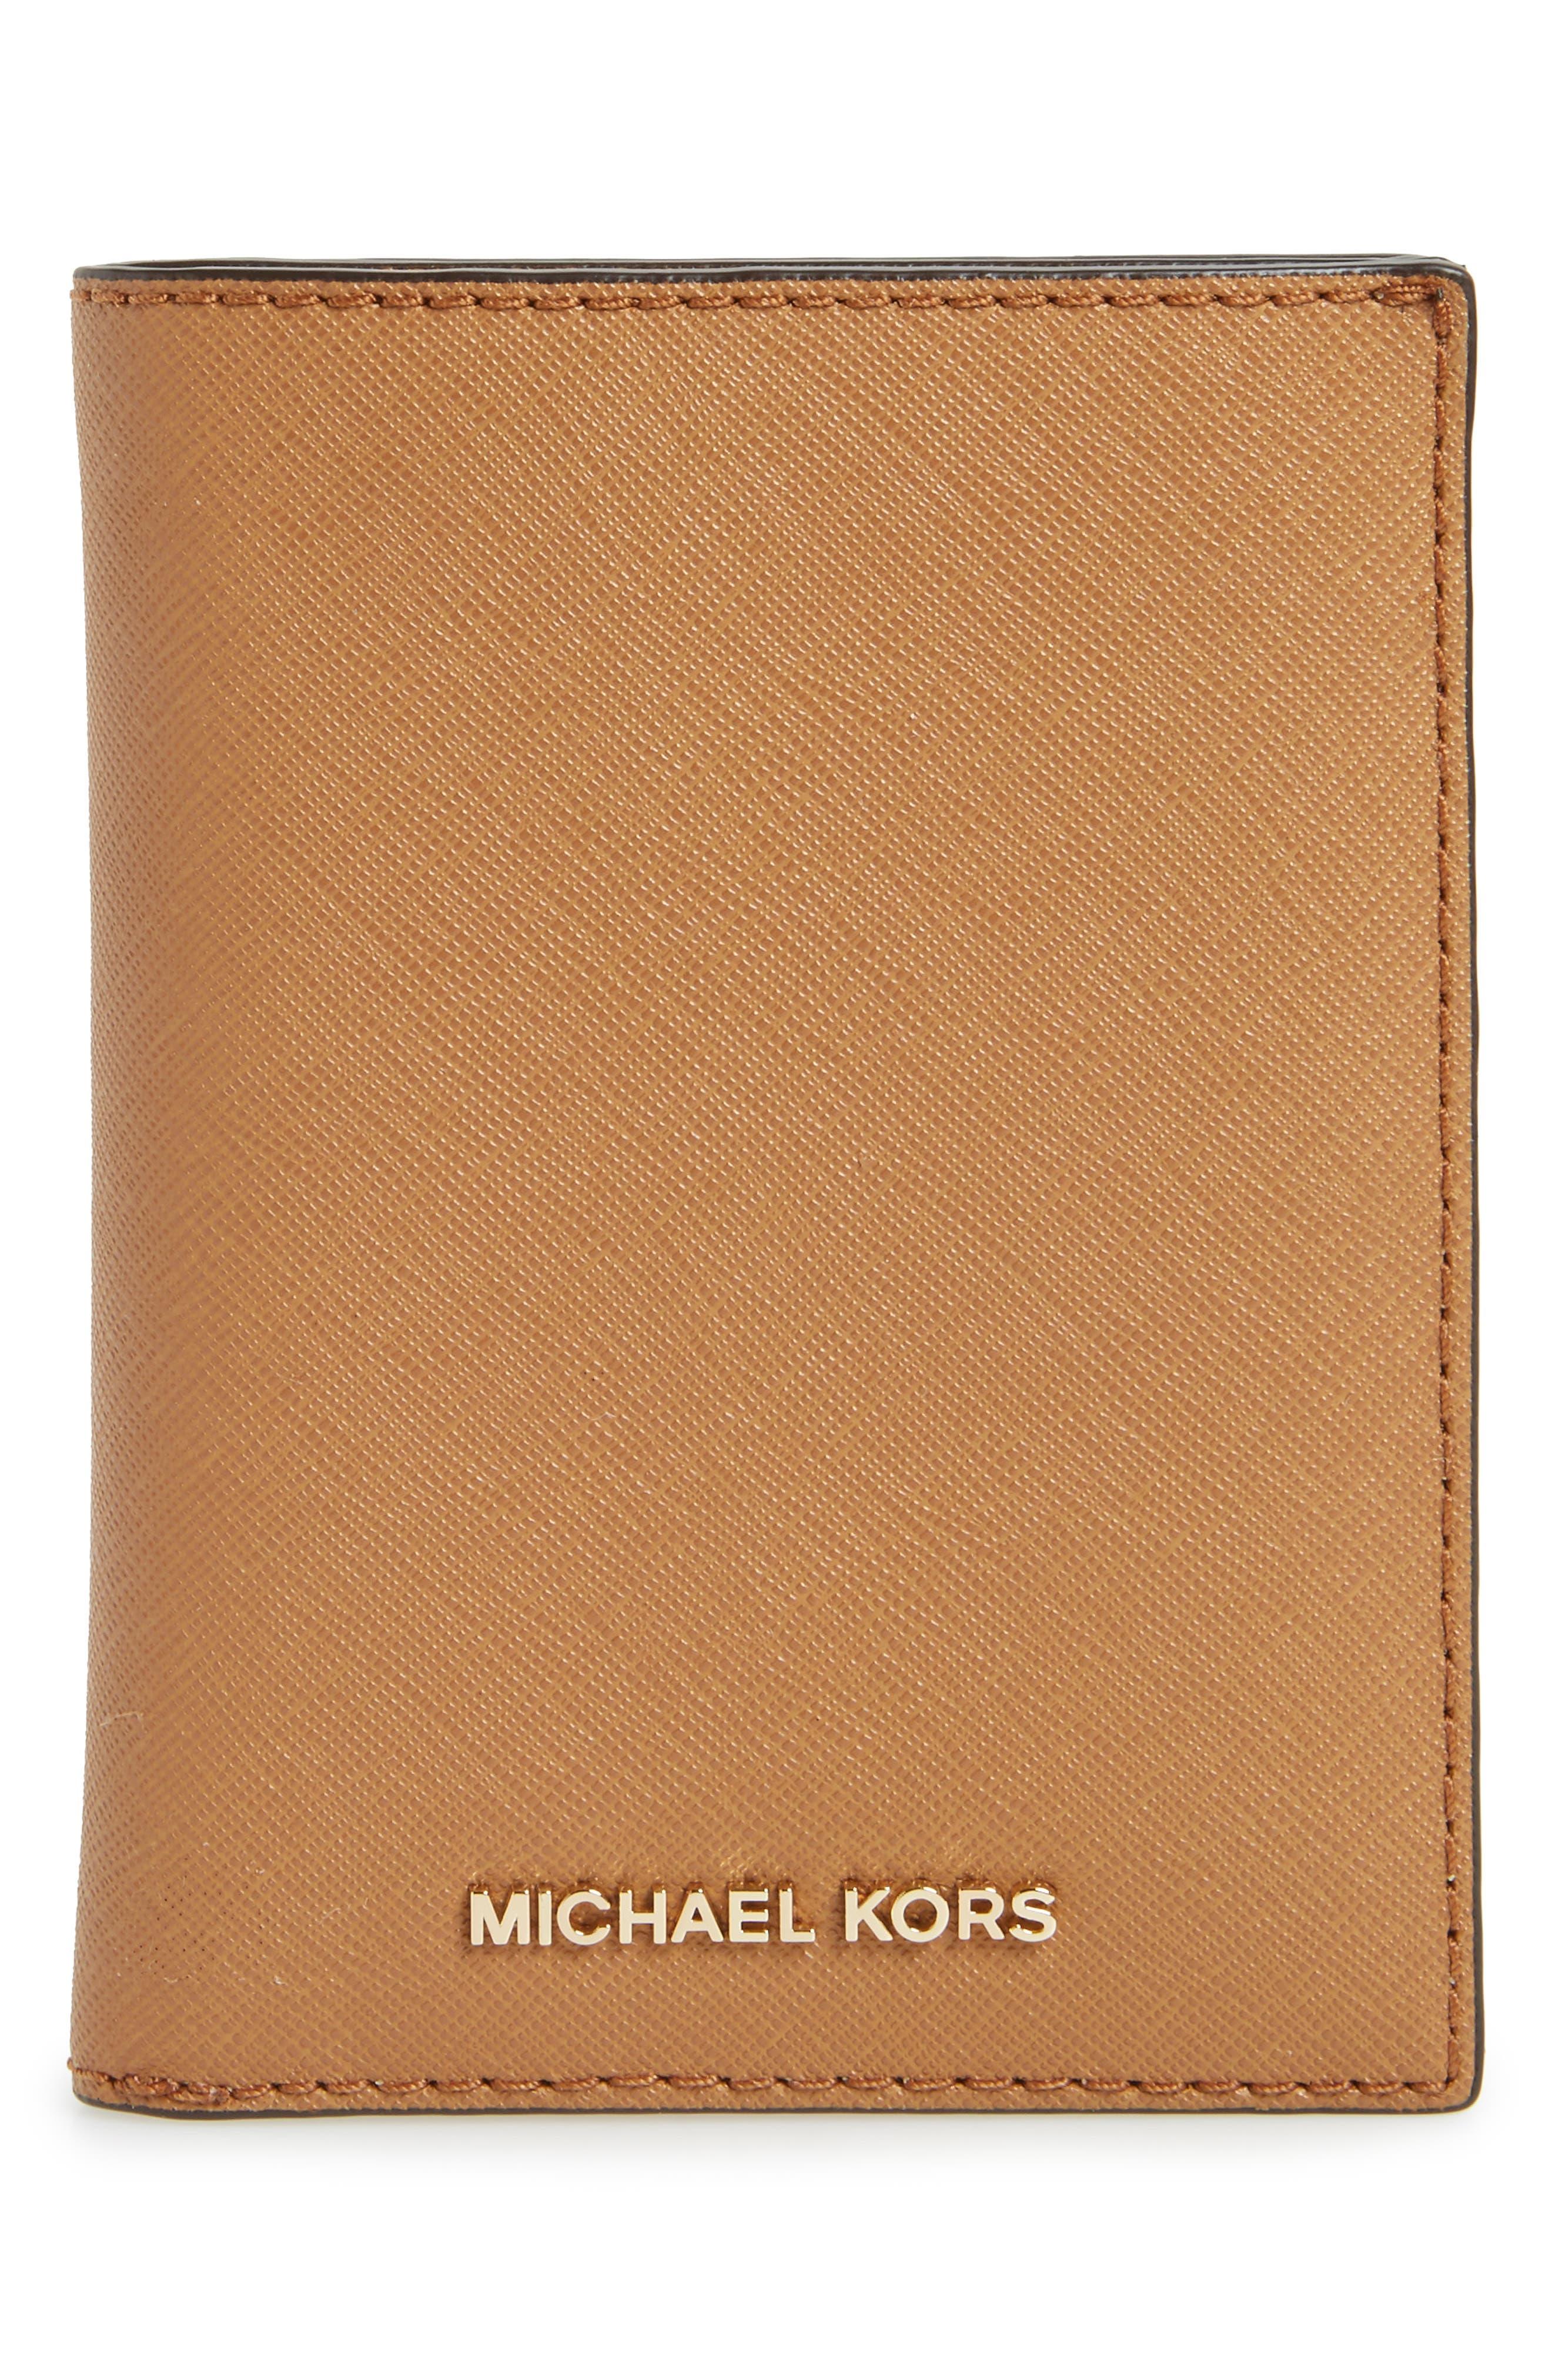 MICHAEL Michael Kors \u0027Jet Set\u0027 Leather Passport Wallet